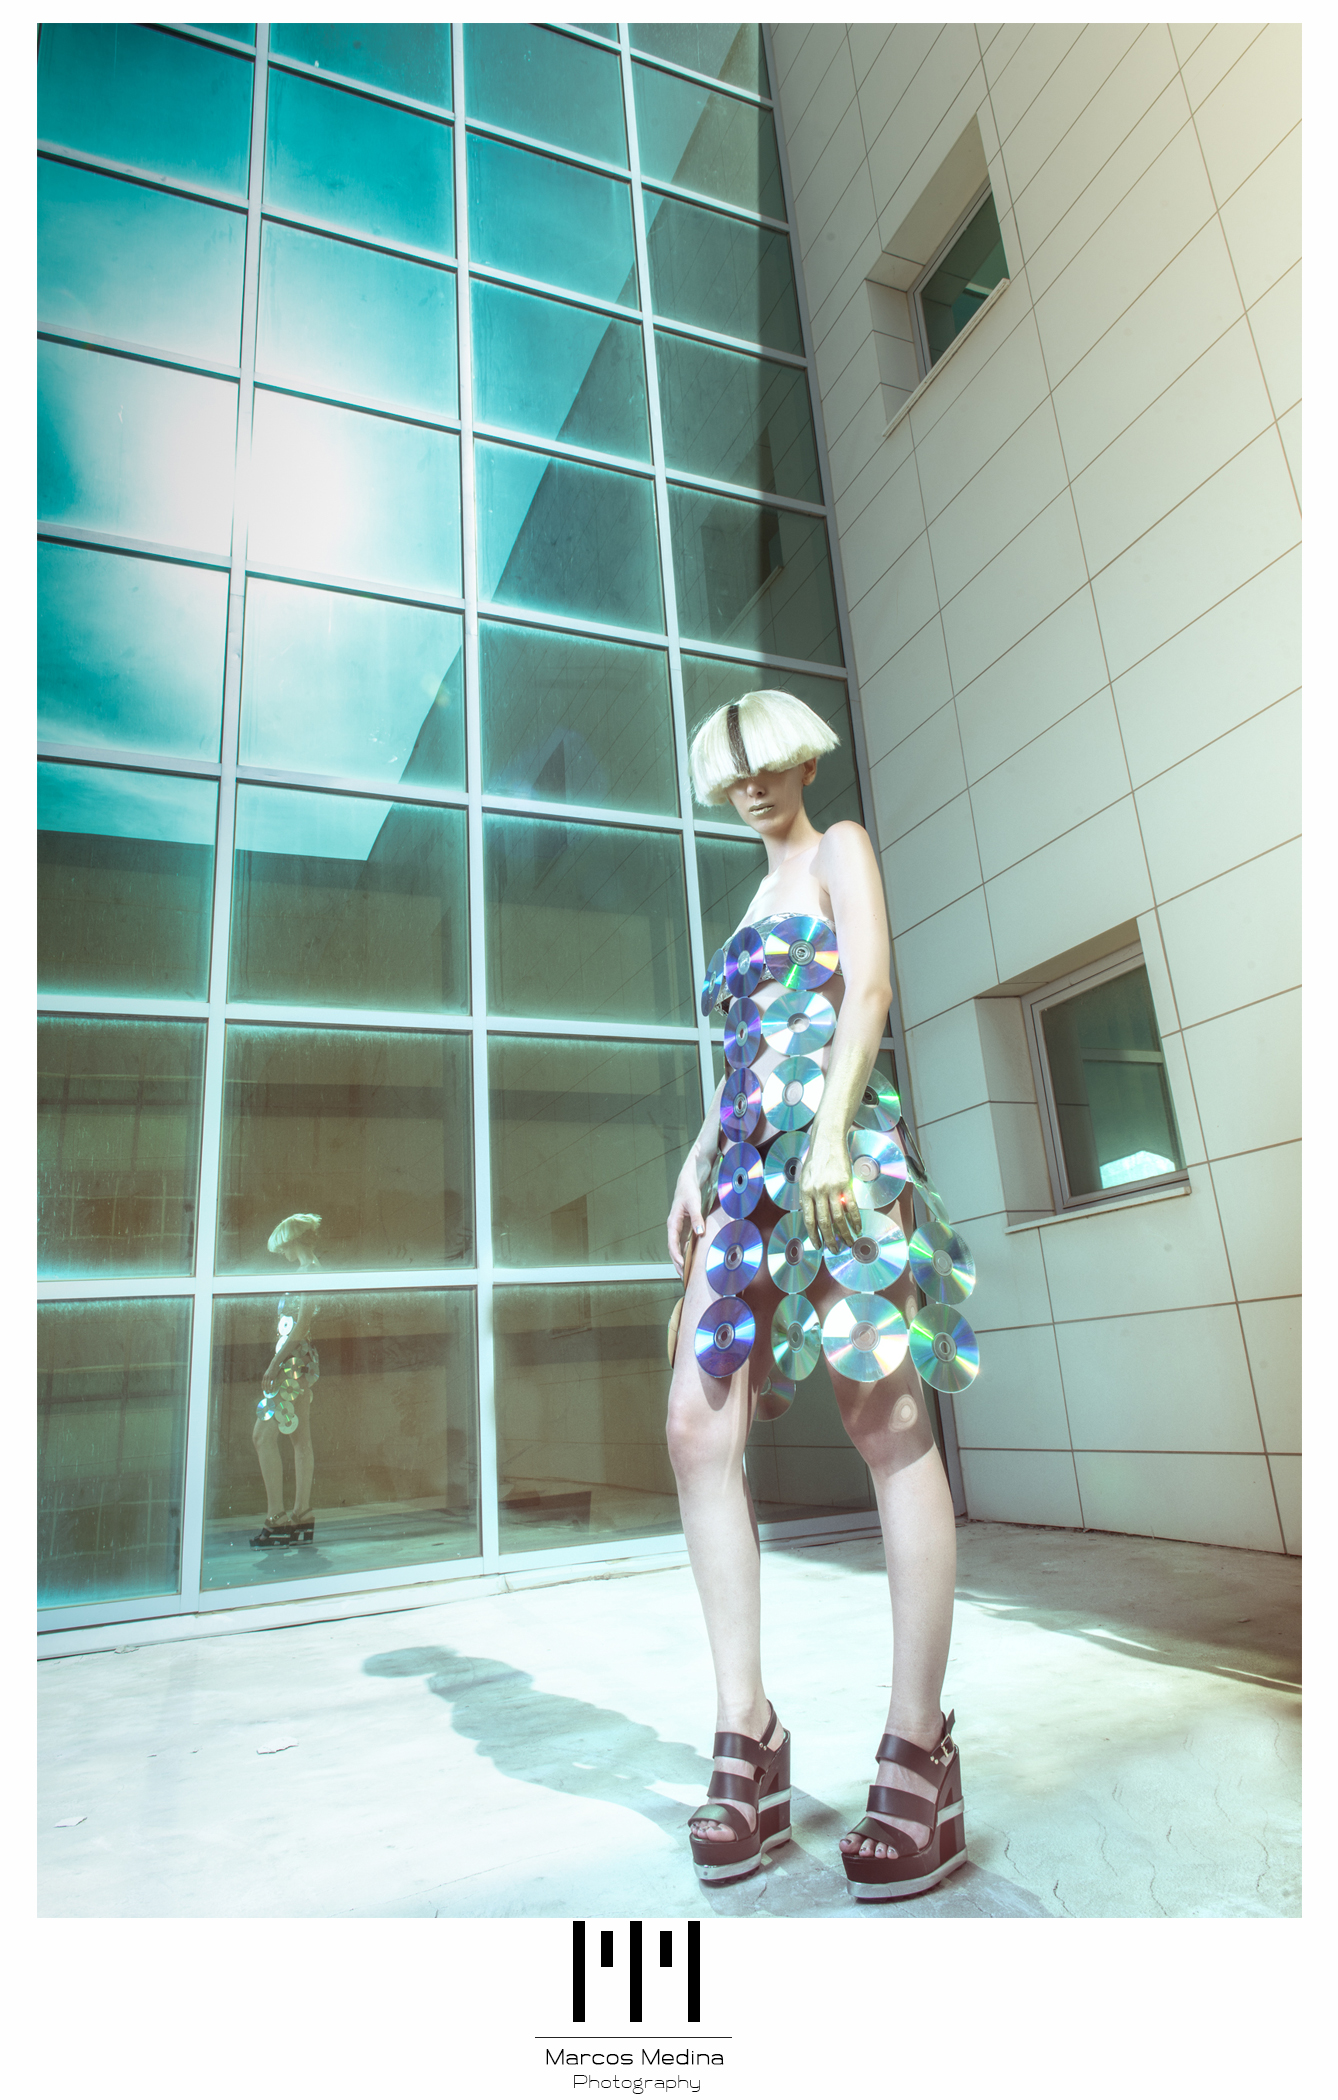 Marcos_Medina_Photography_Fashion_Futurista_11